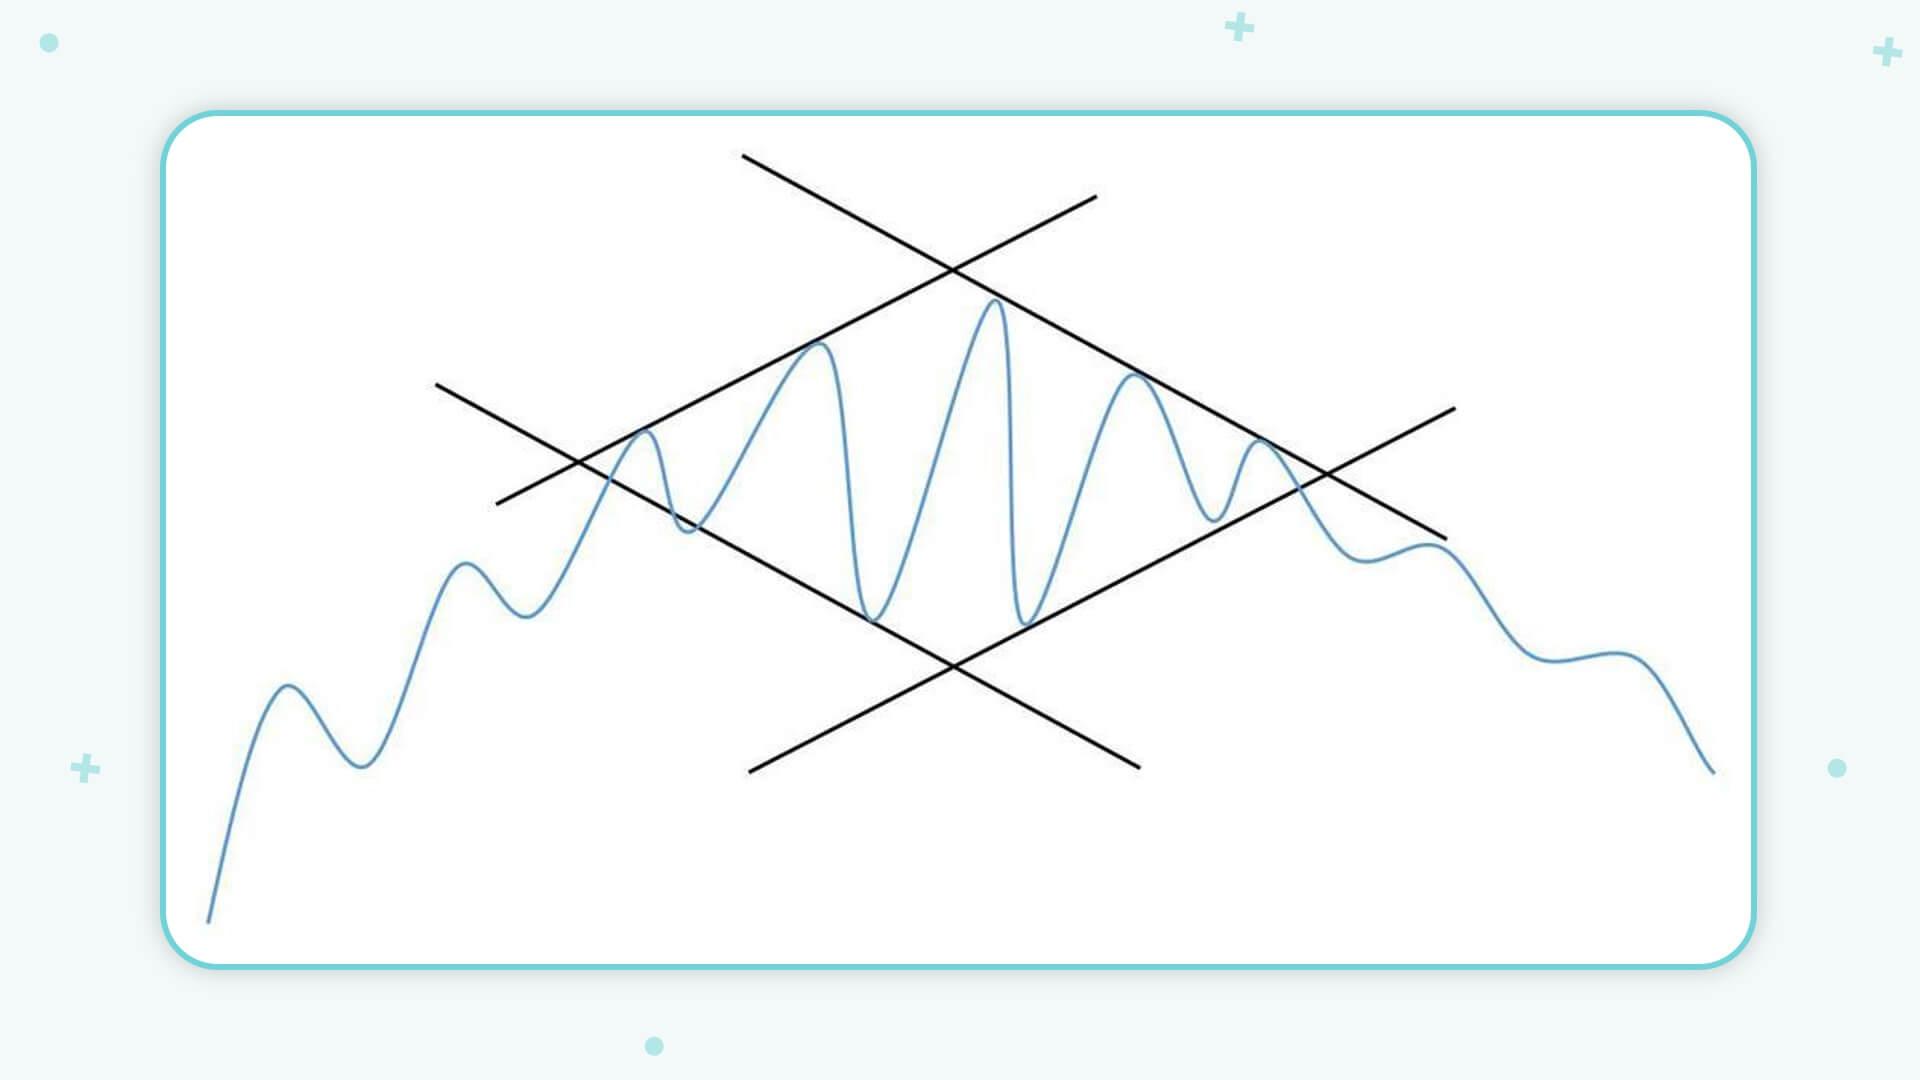 الگوهای کلاسیک: الگوی الماس